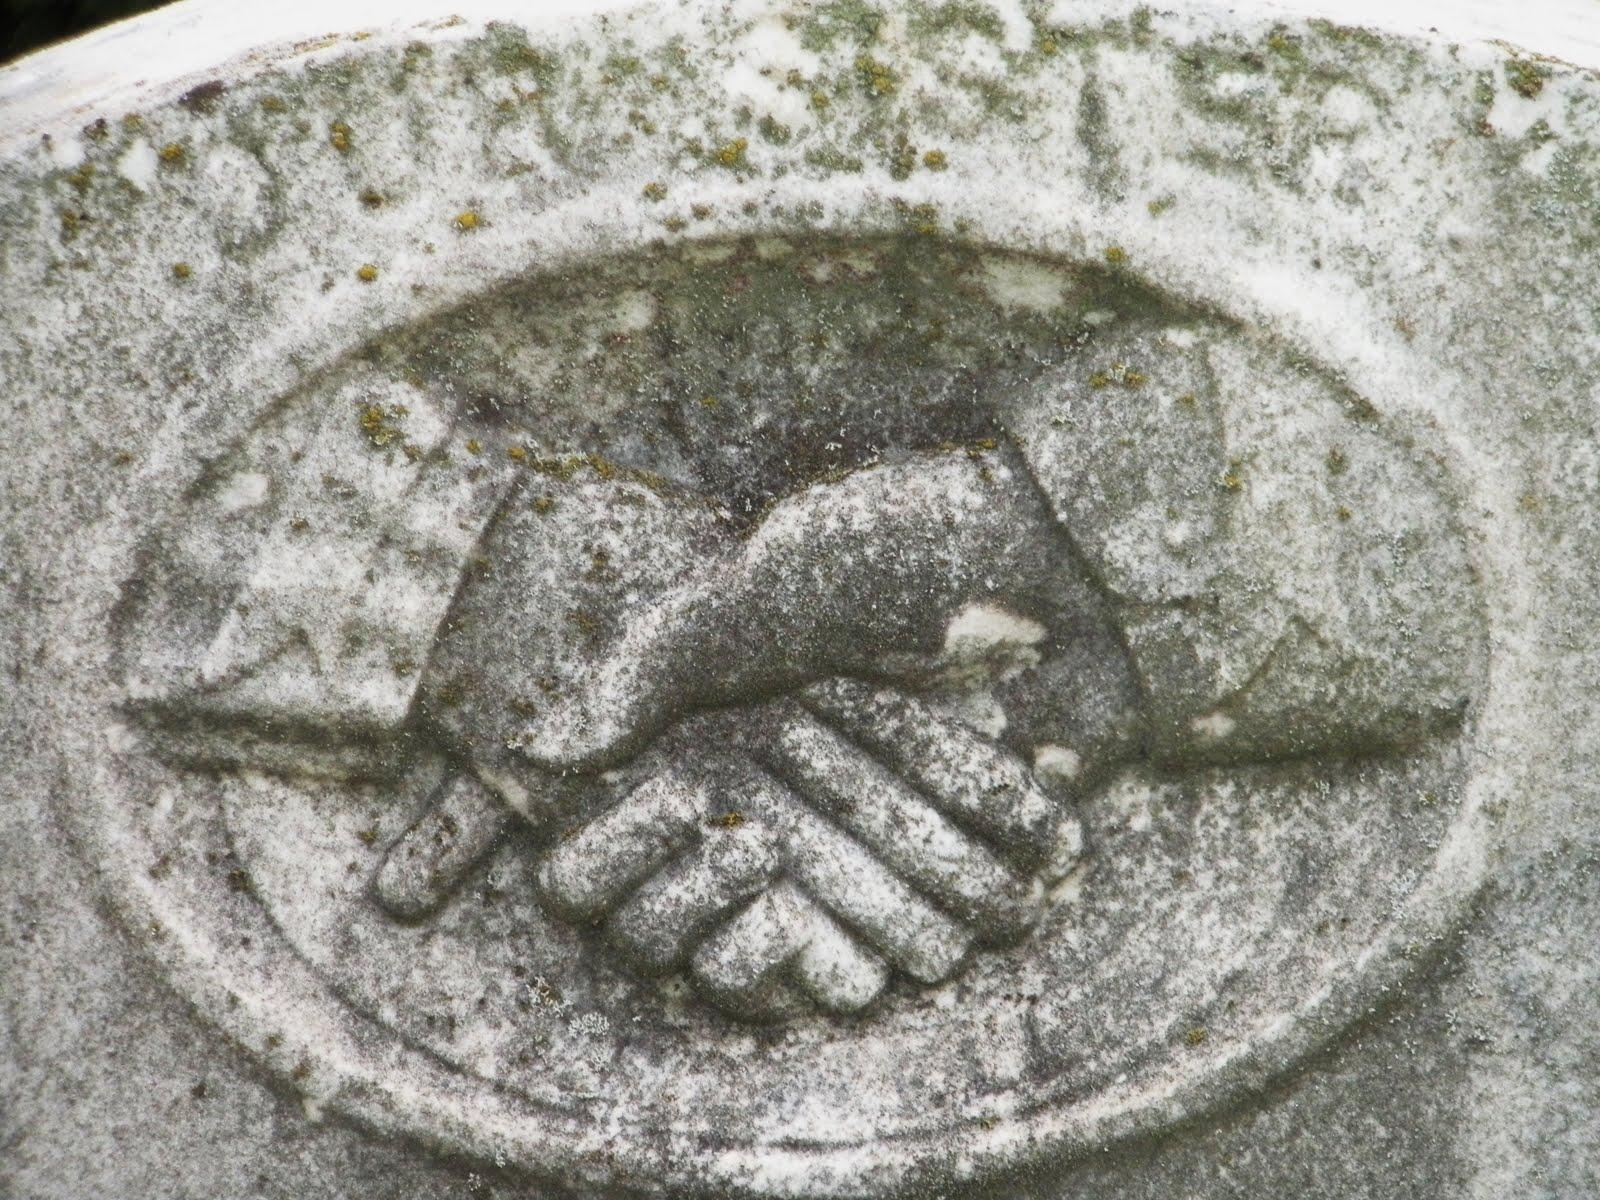 Engraved: : The Final Handshake